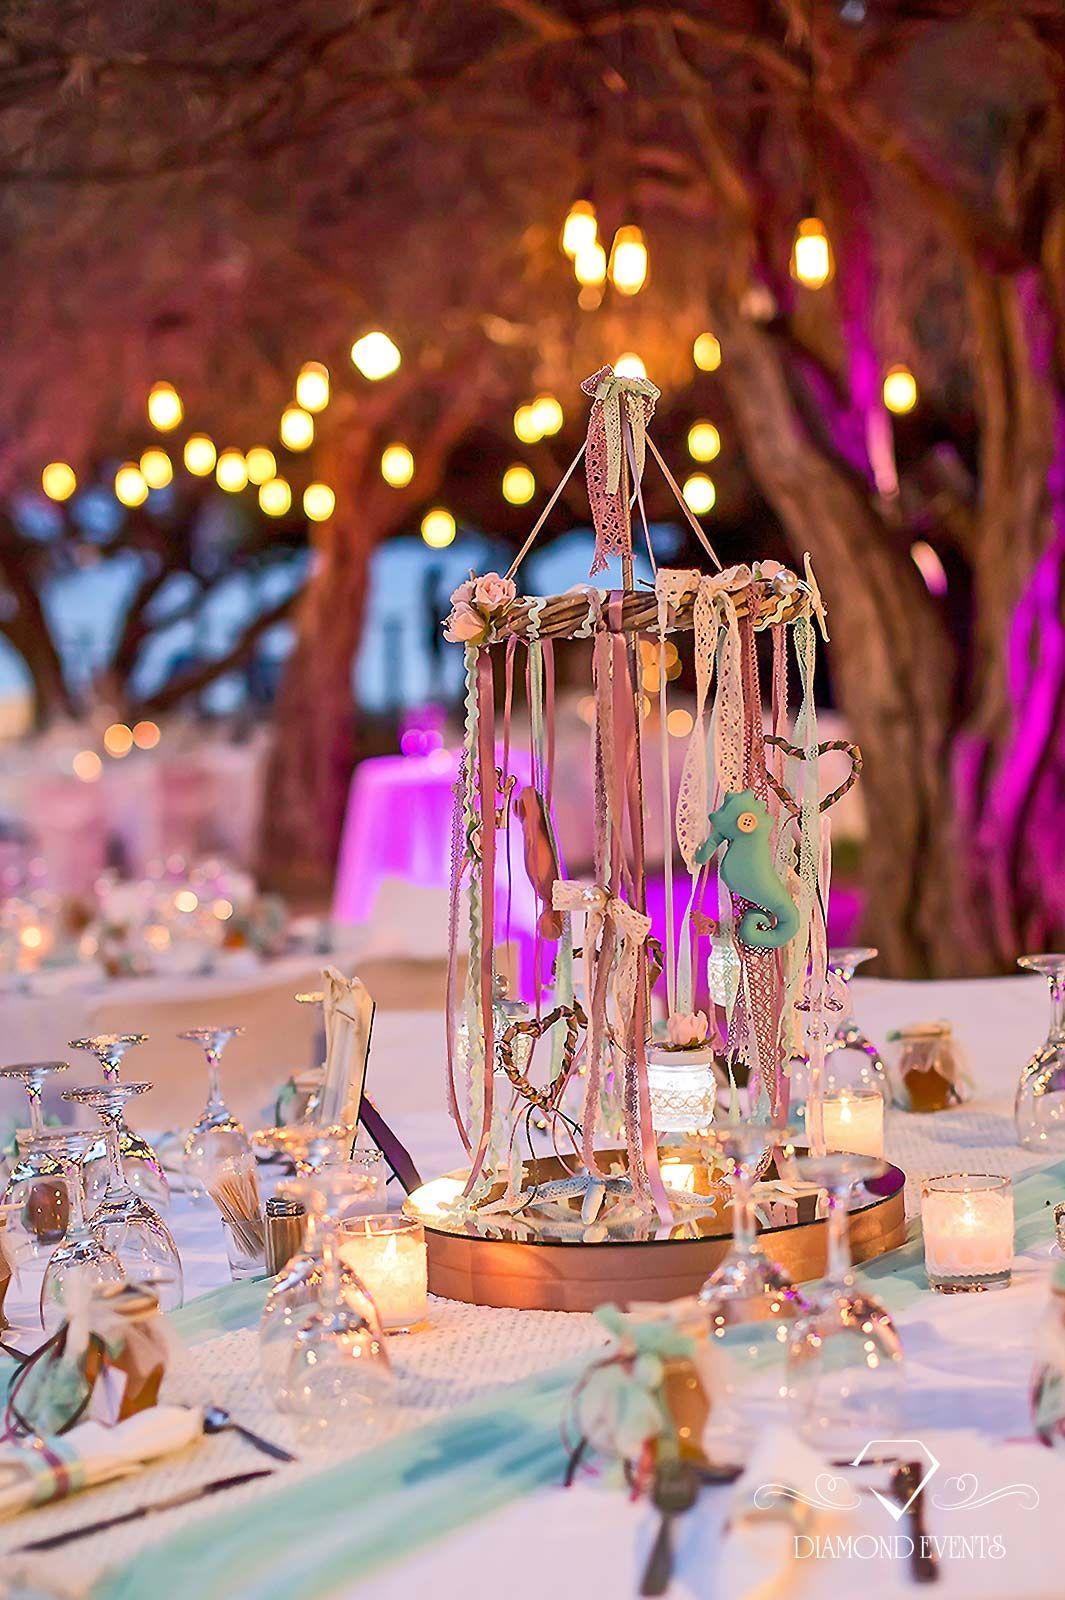 Romantic Wedding Carousel Decoration Abudhabi Amazing Athens Azerbaijan Blue Bridal Bride Candles Celebr Insta Wedding Wedding Event Planning Wedding